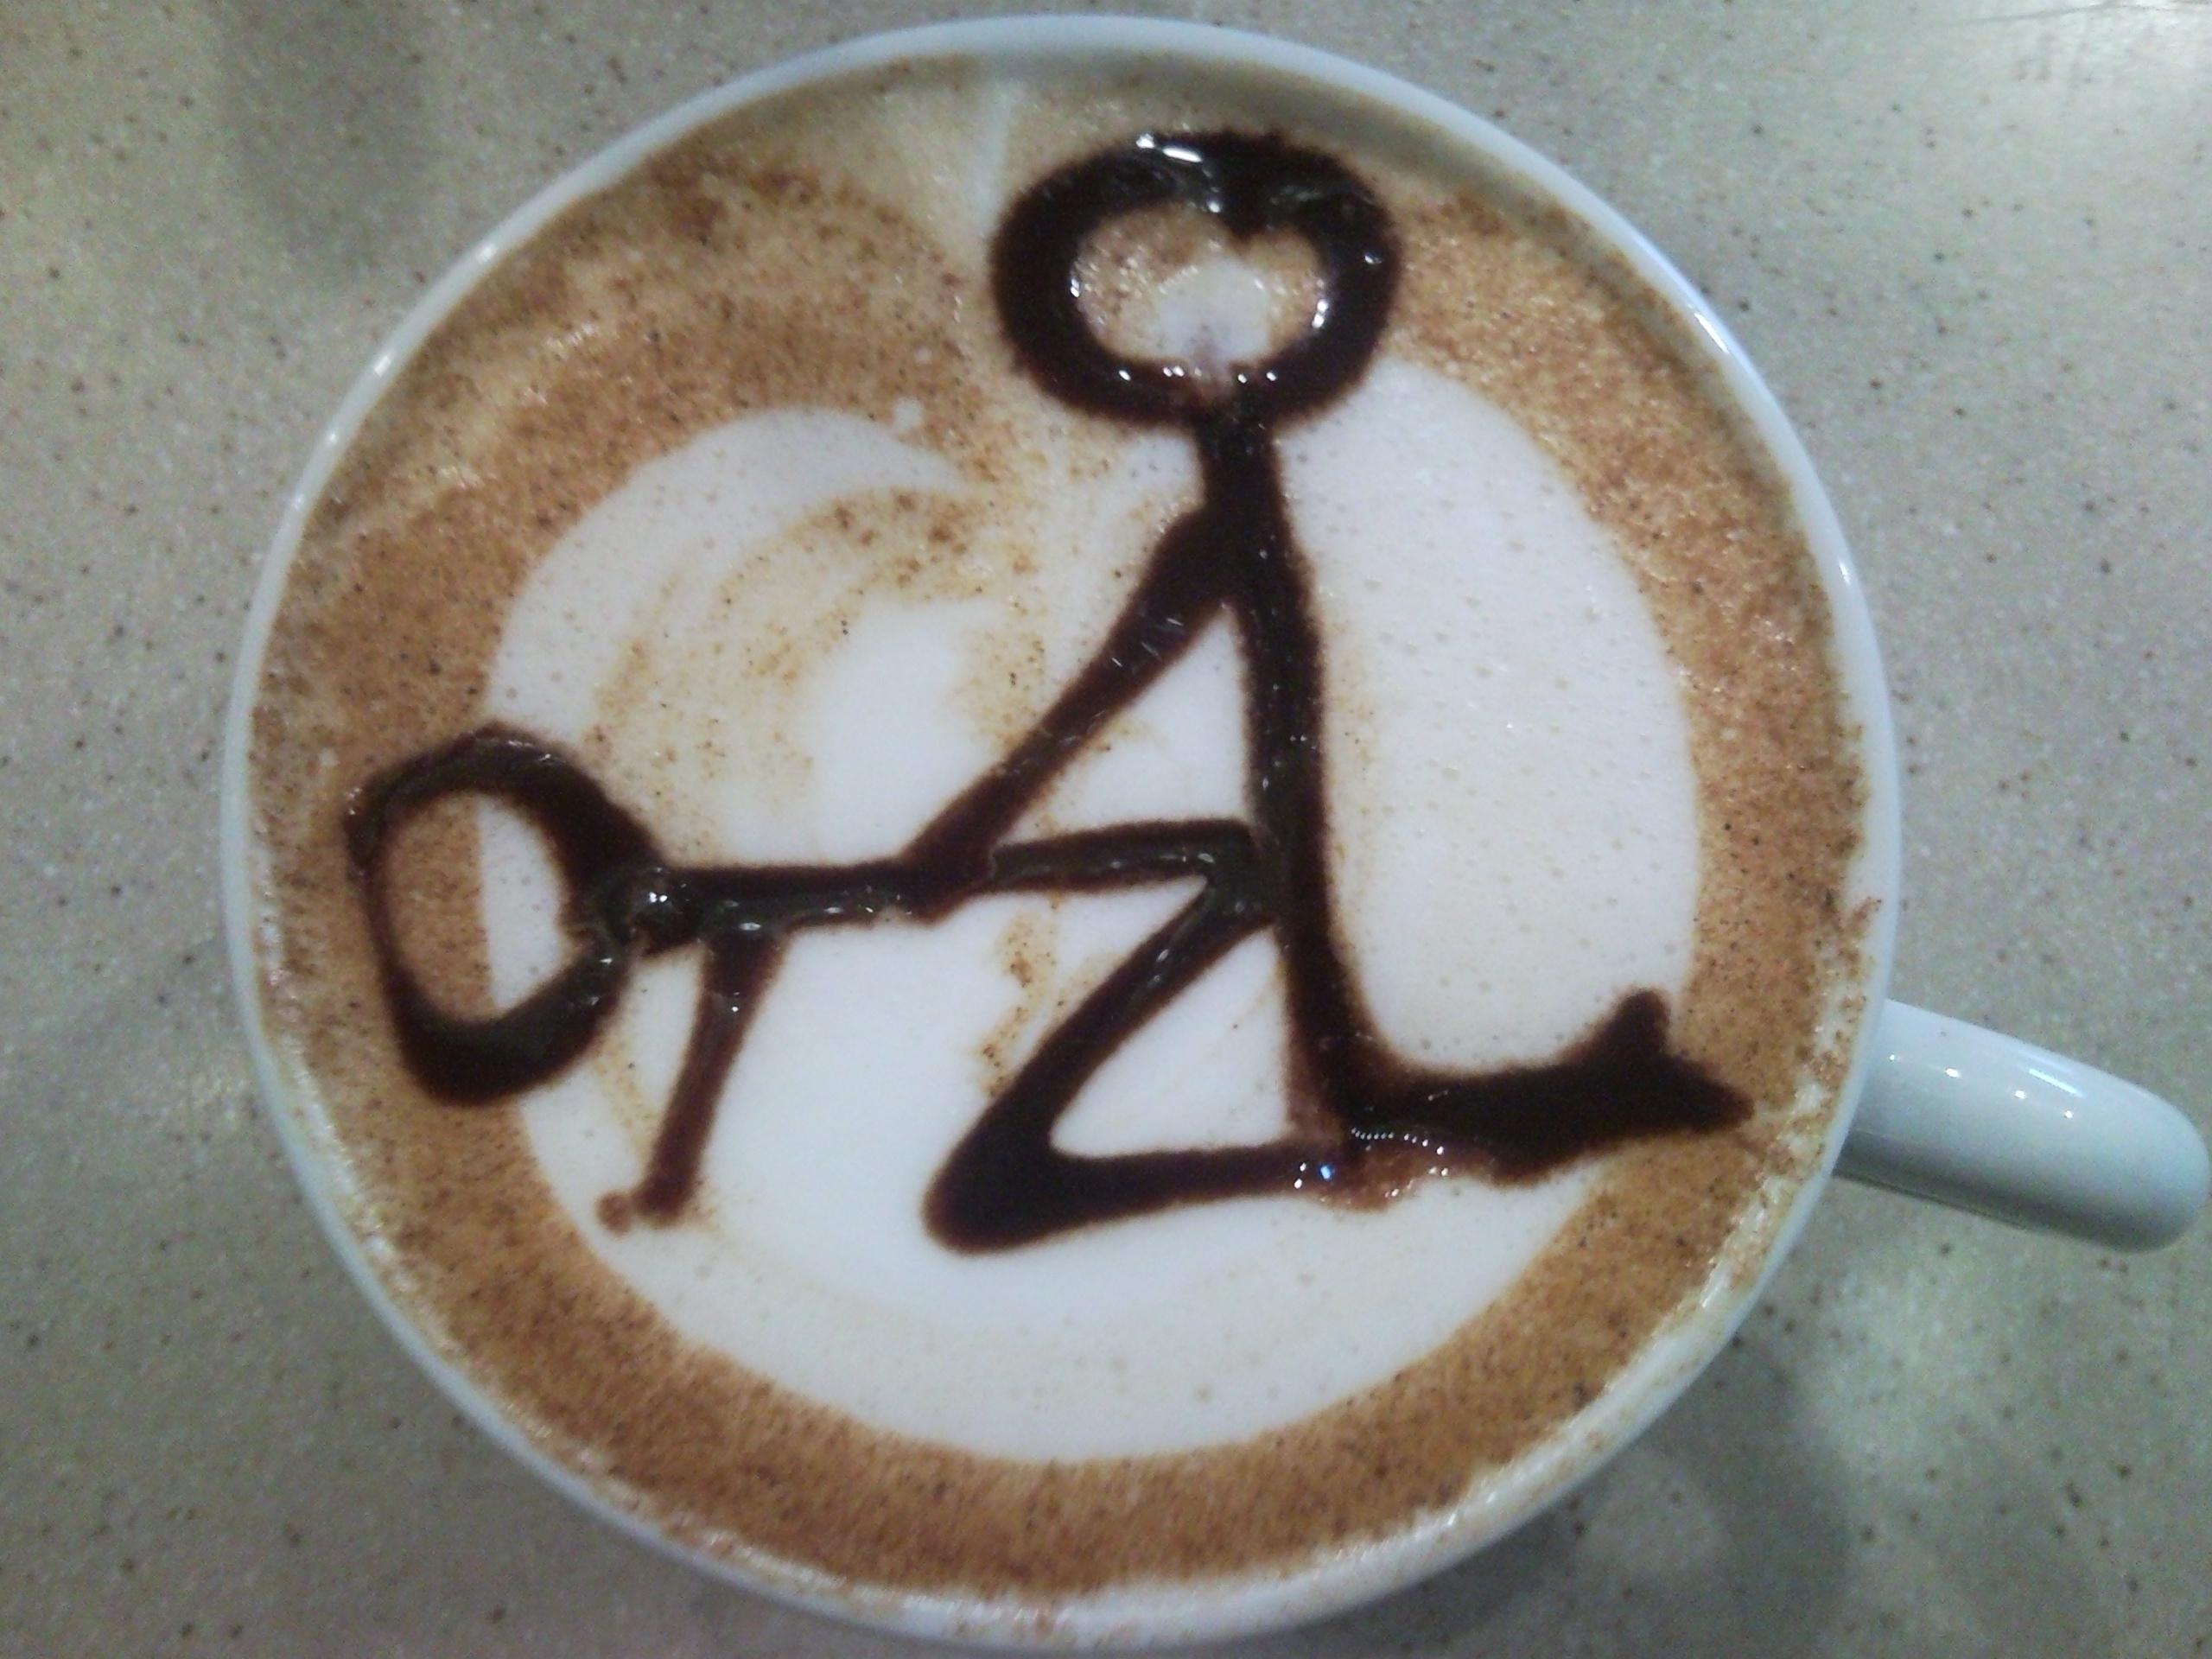 coffe_art_by_miklerst-d45ilyb